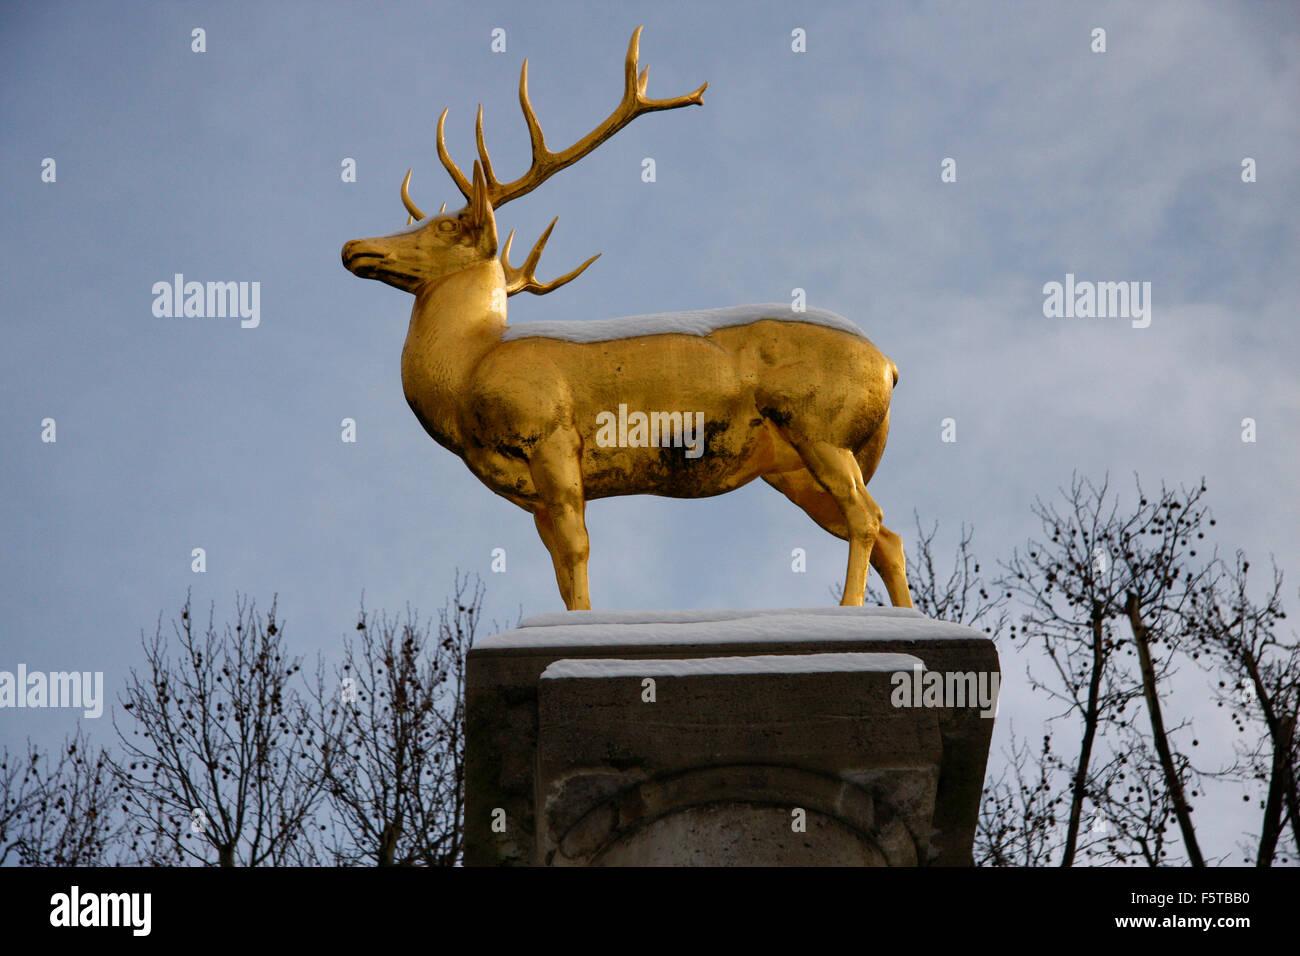 Goldener Hirsch, Hirschbrunnen, Rudolph Wilde Park, Berlin-Schoeneberg. - Stock Image